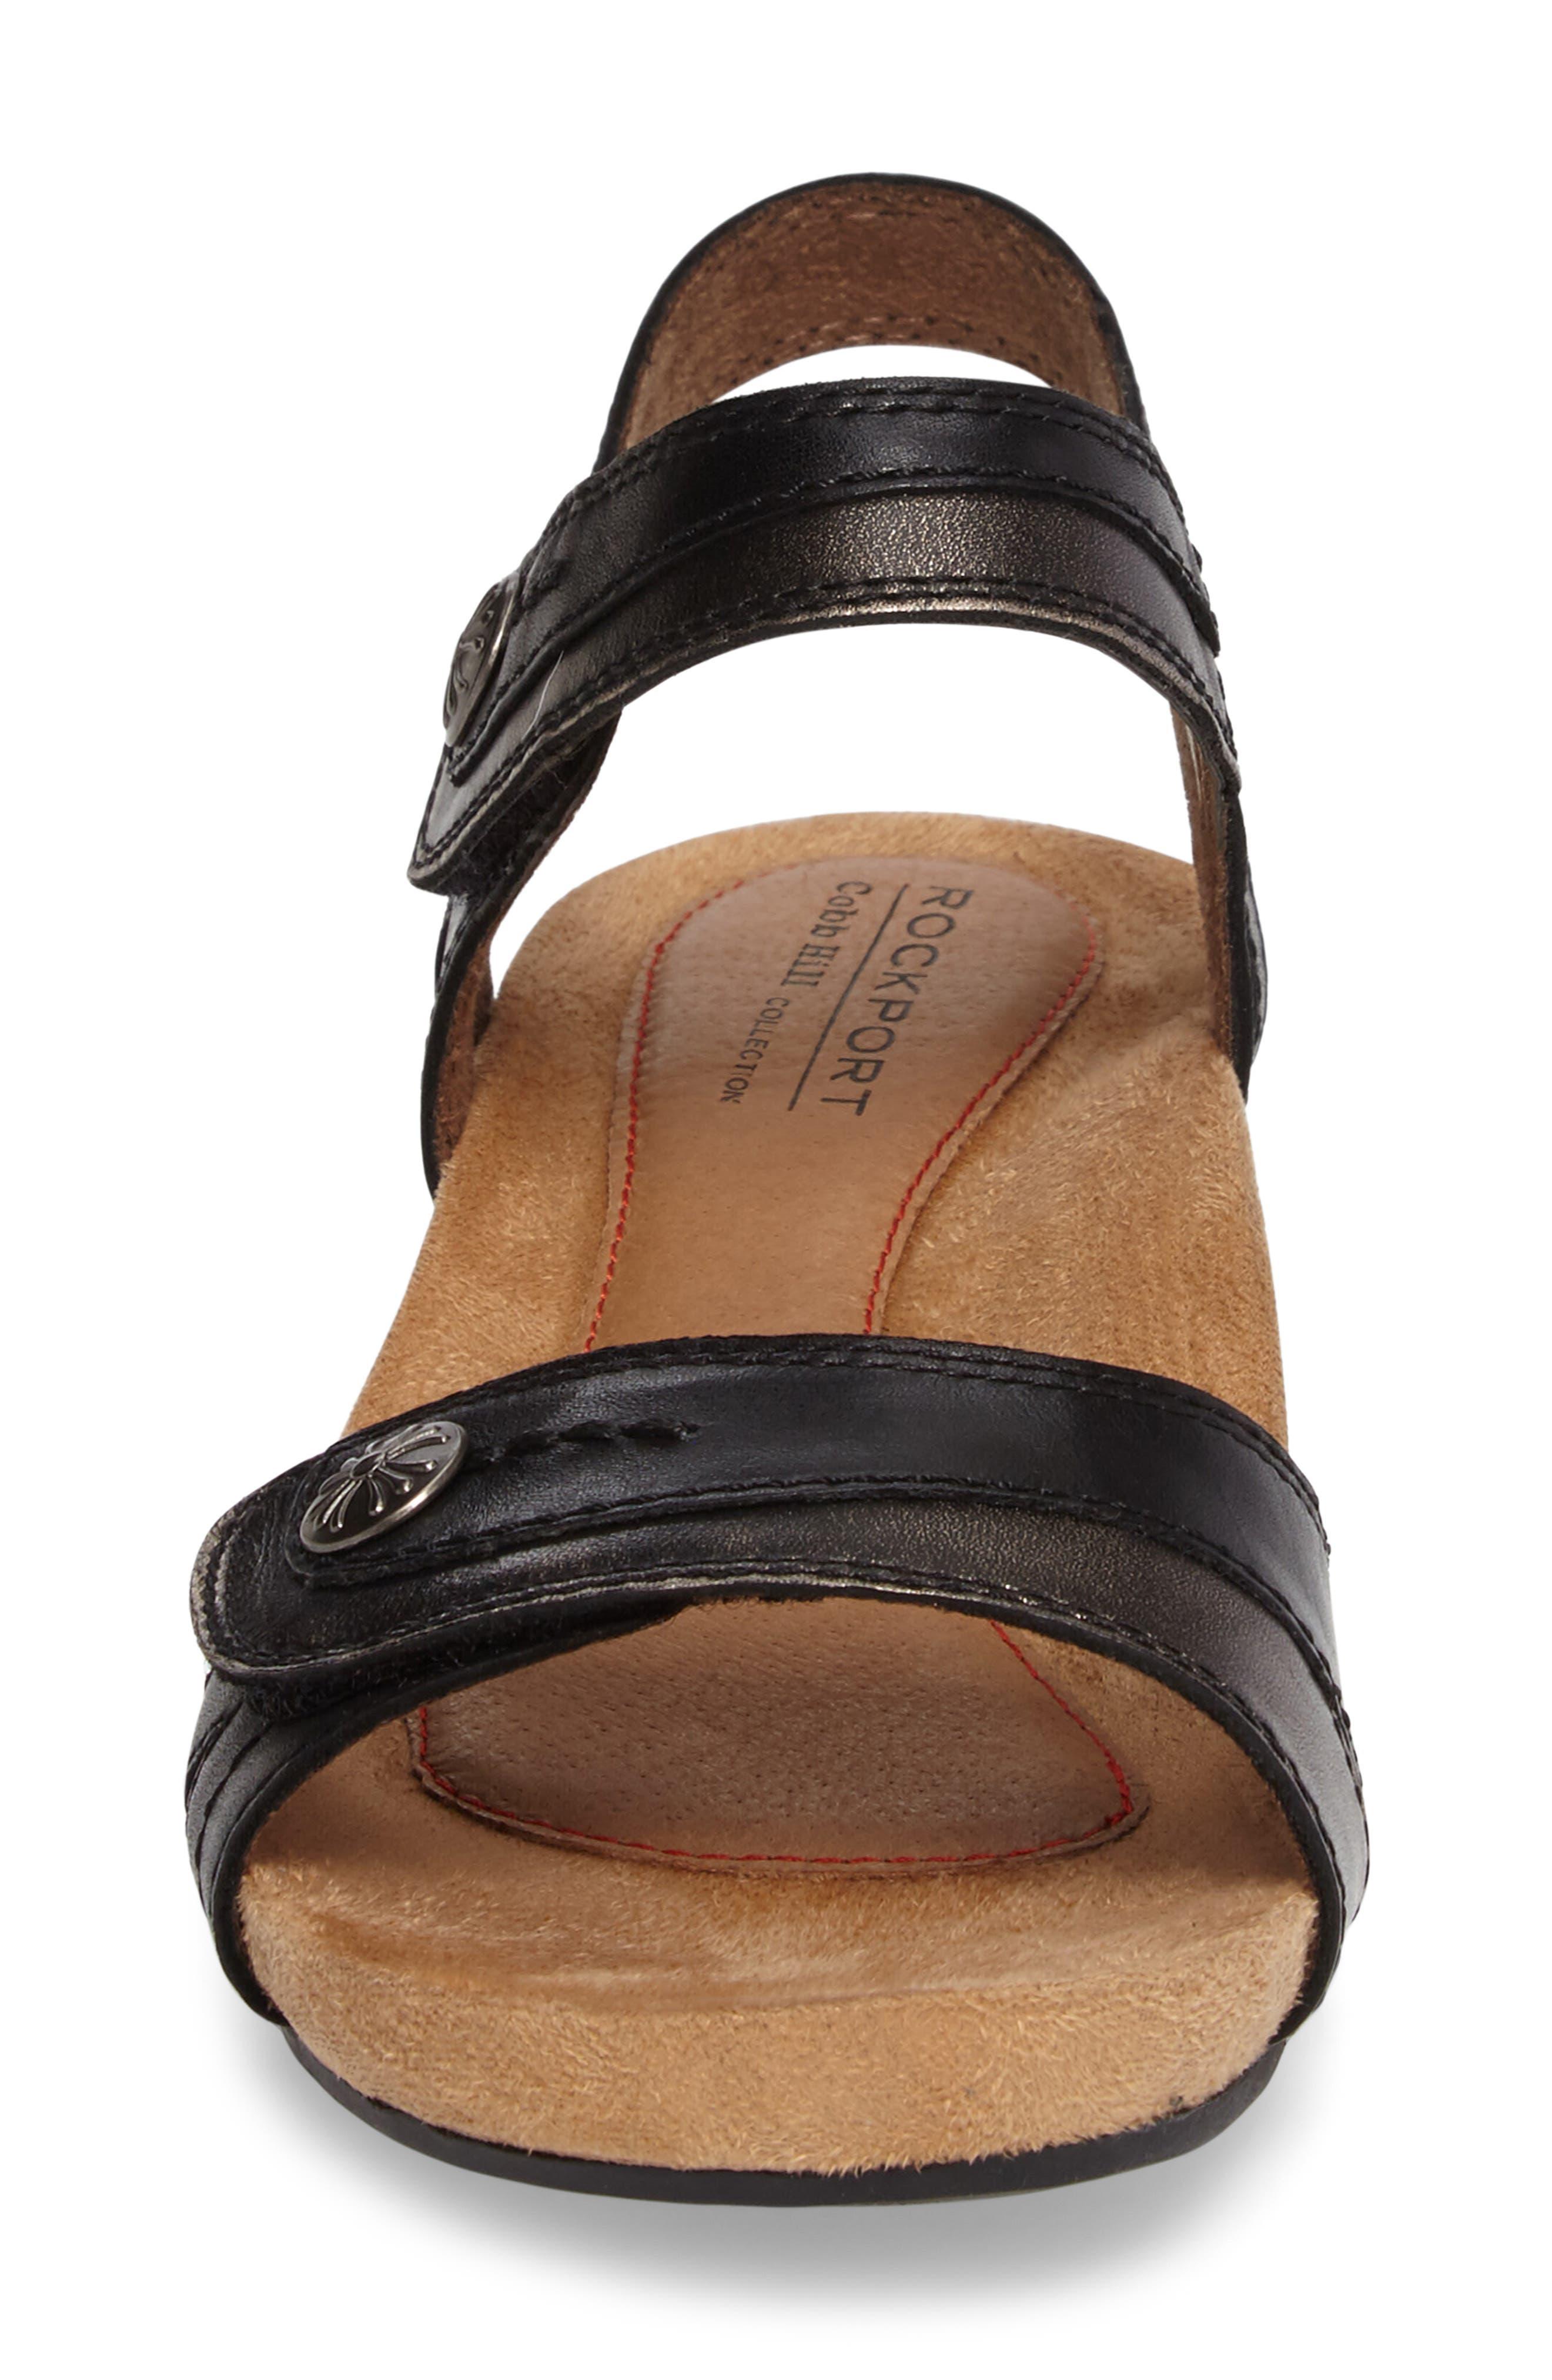 Hollywood Wedge Sandal,                             Alternate thumbnail 4, color,                             BLACK LEATHER